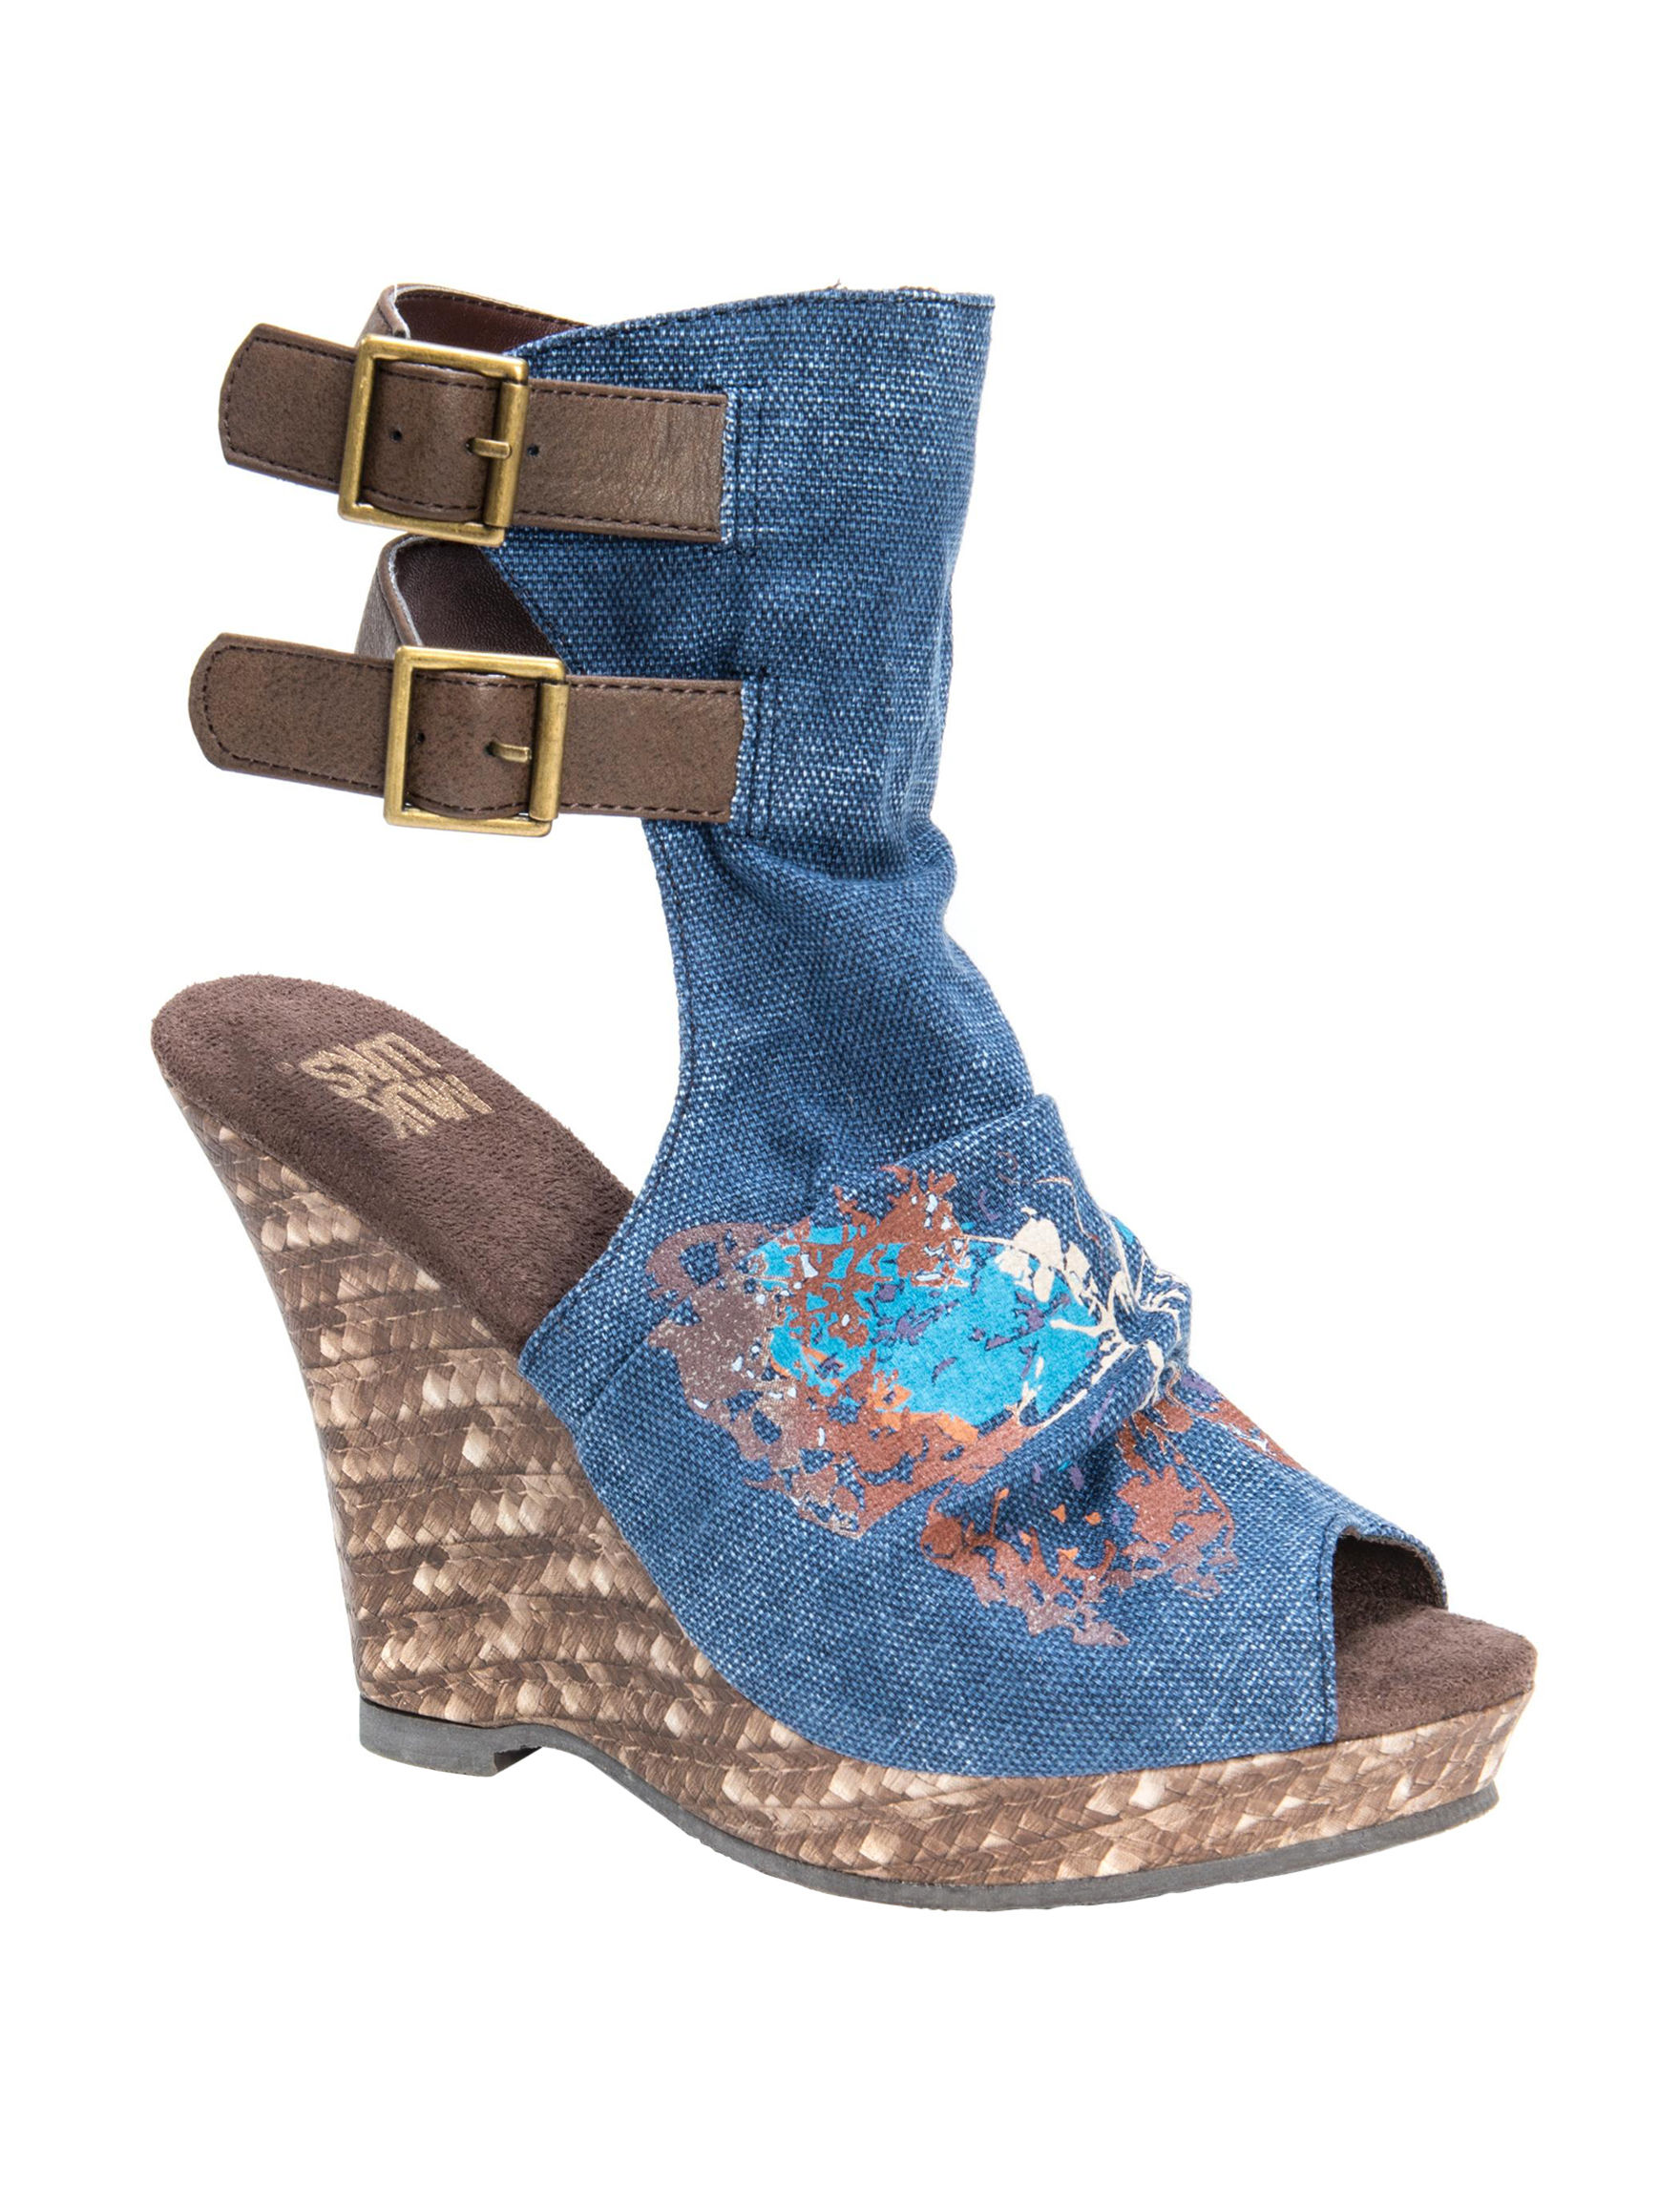 Muk Luks Denim Blue Peep Toe Platform Wedge Sandals